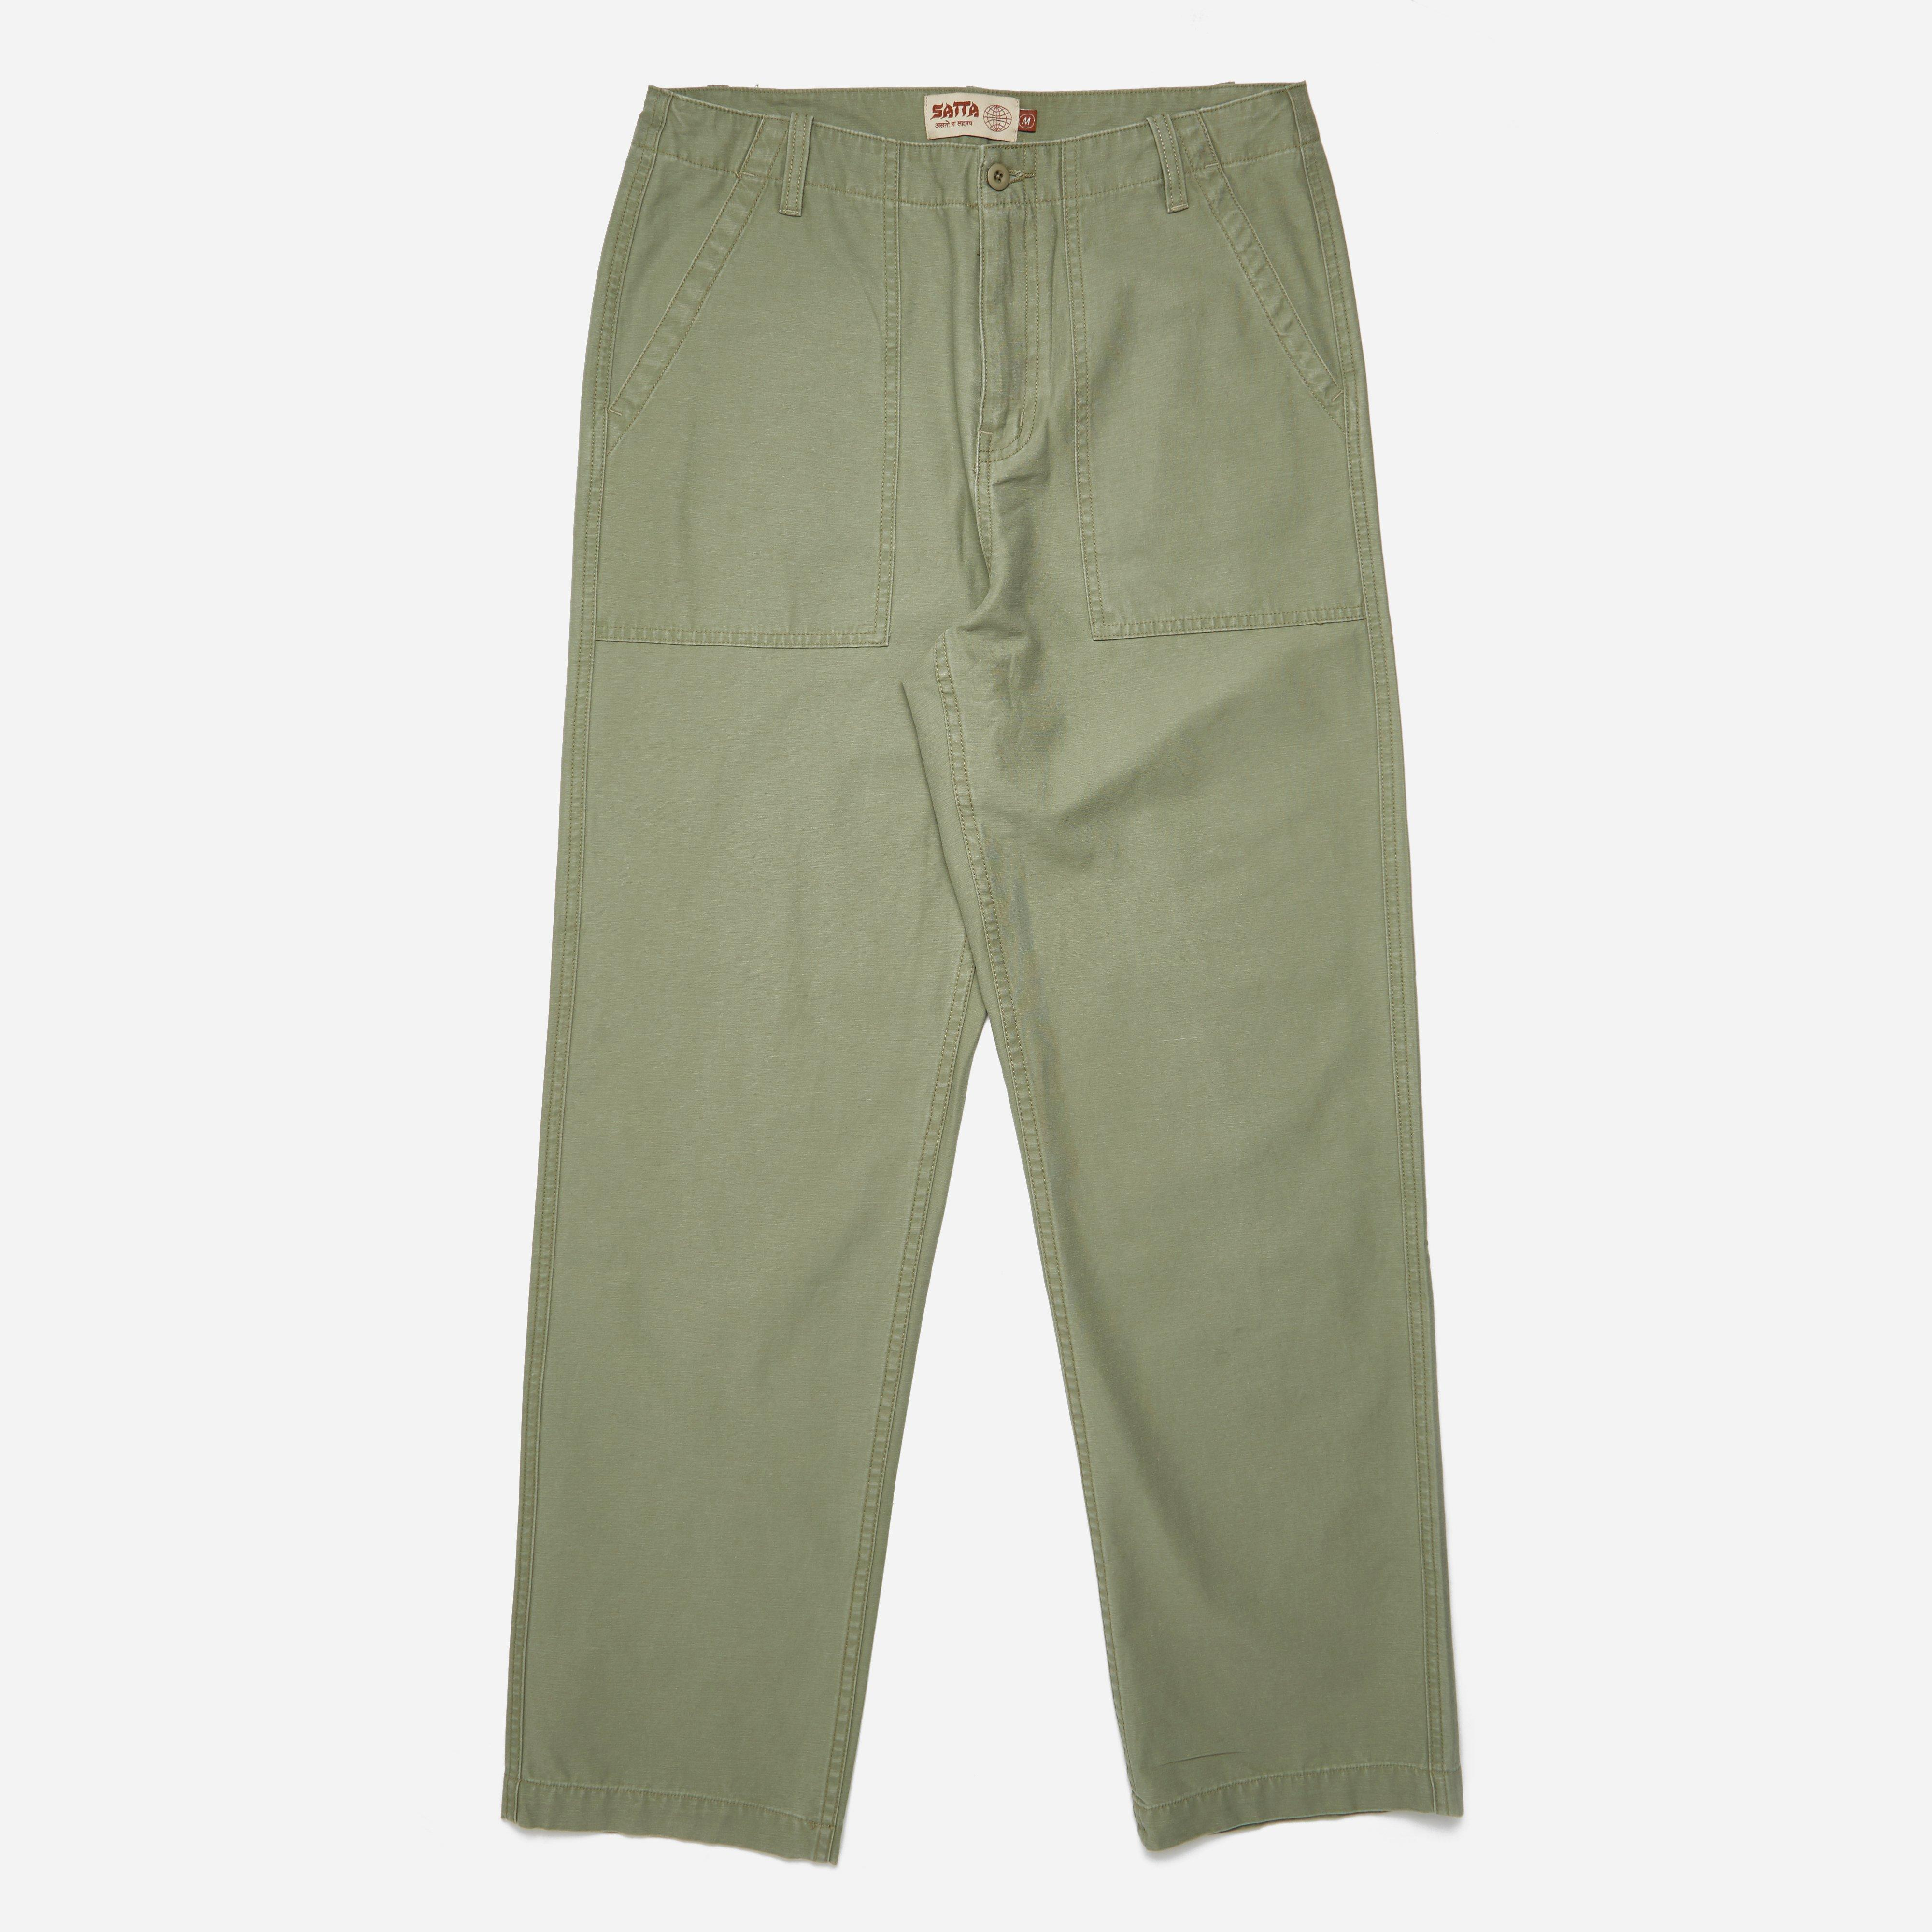 Satta Utility Pants